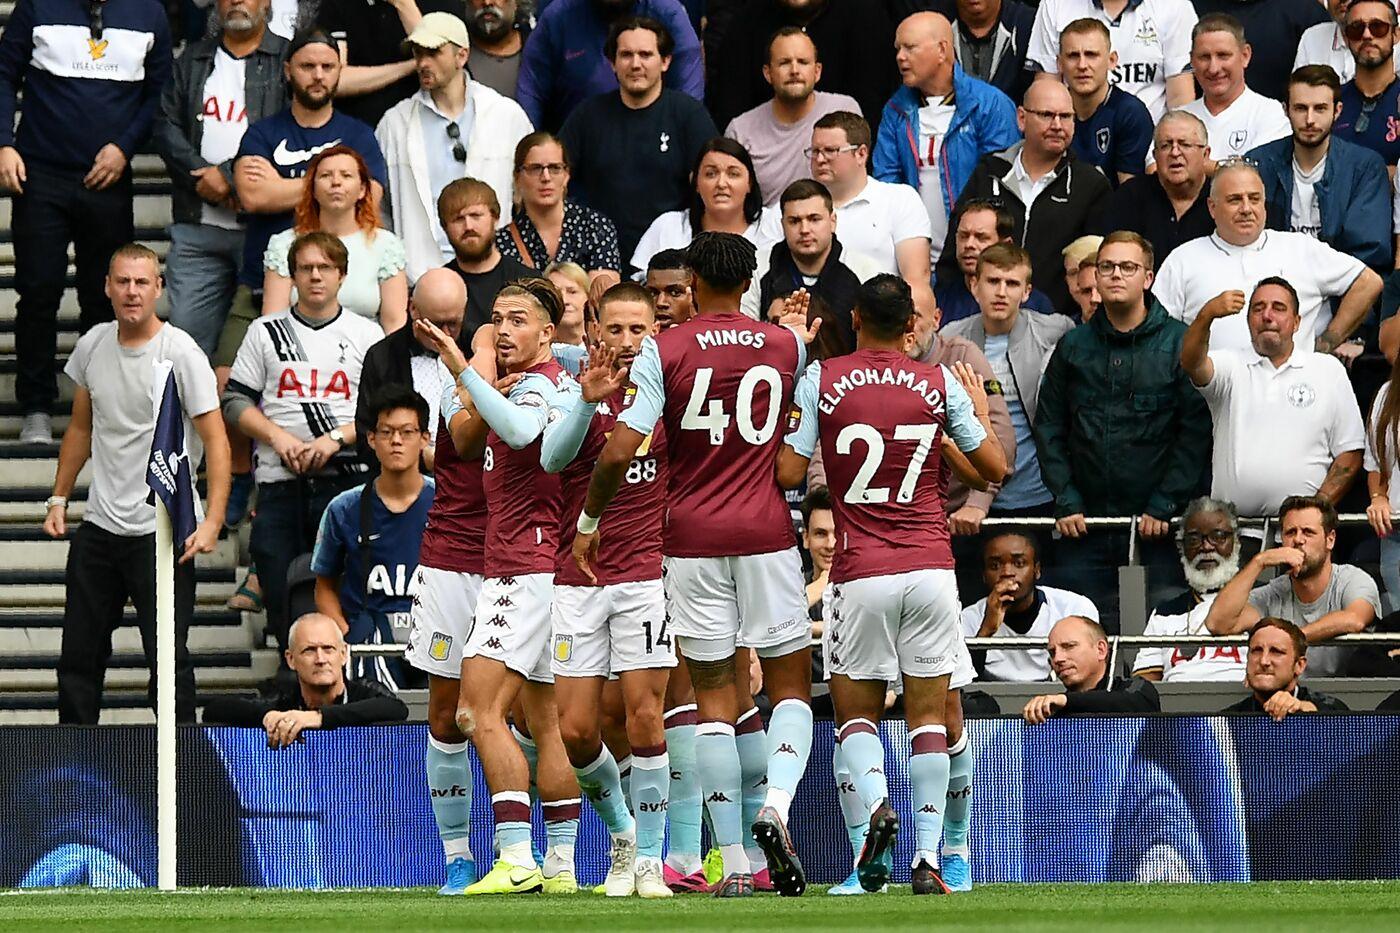 Pronostico Aston Villa-Exeter U23 16 gennaio: le quote di Premier League Cup